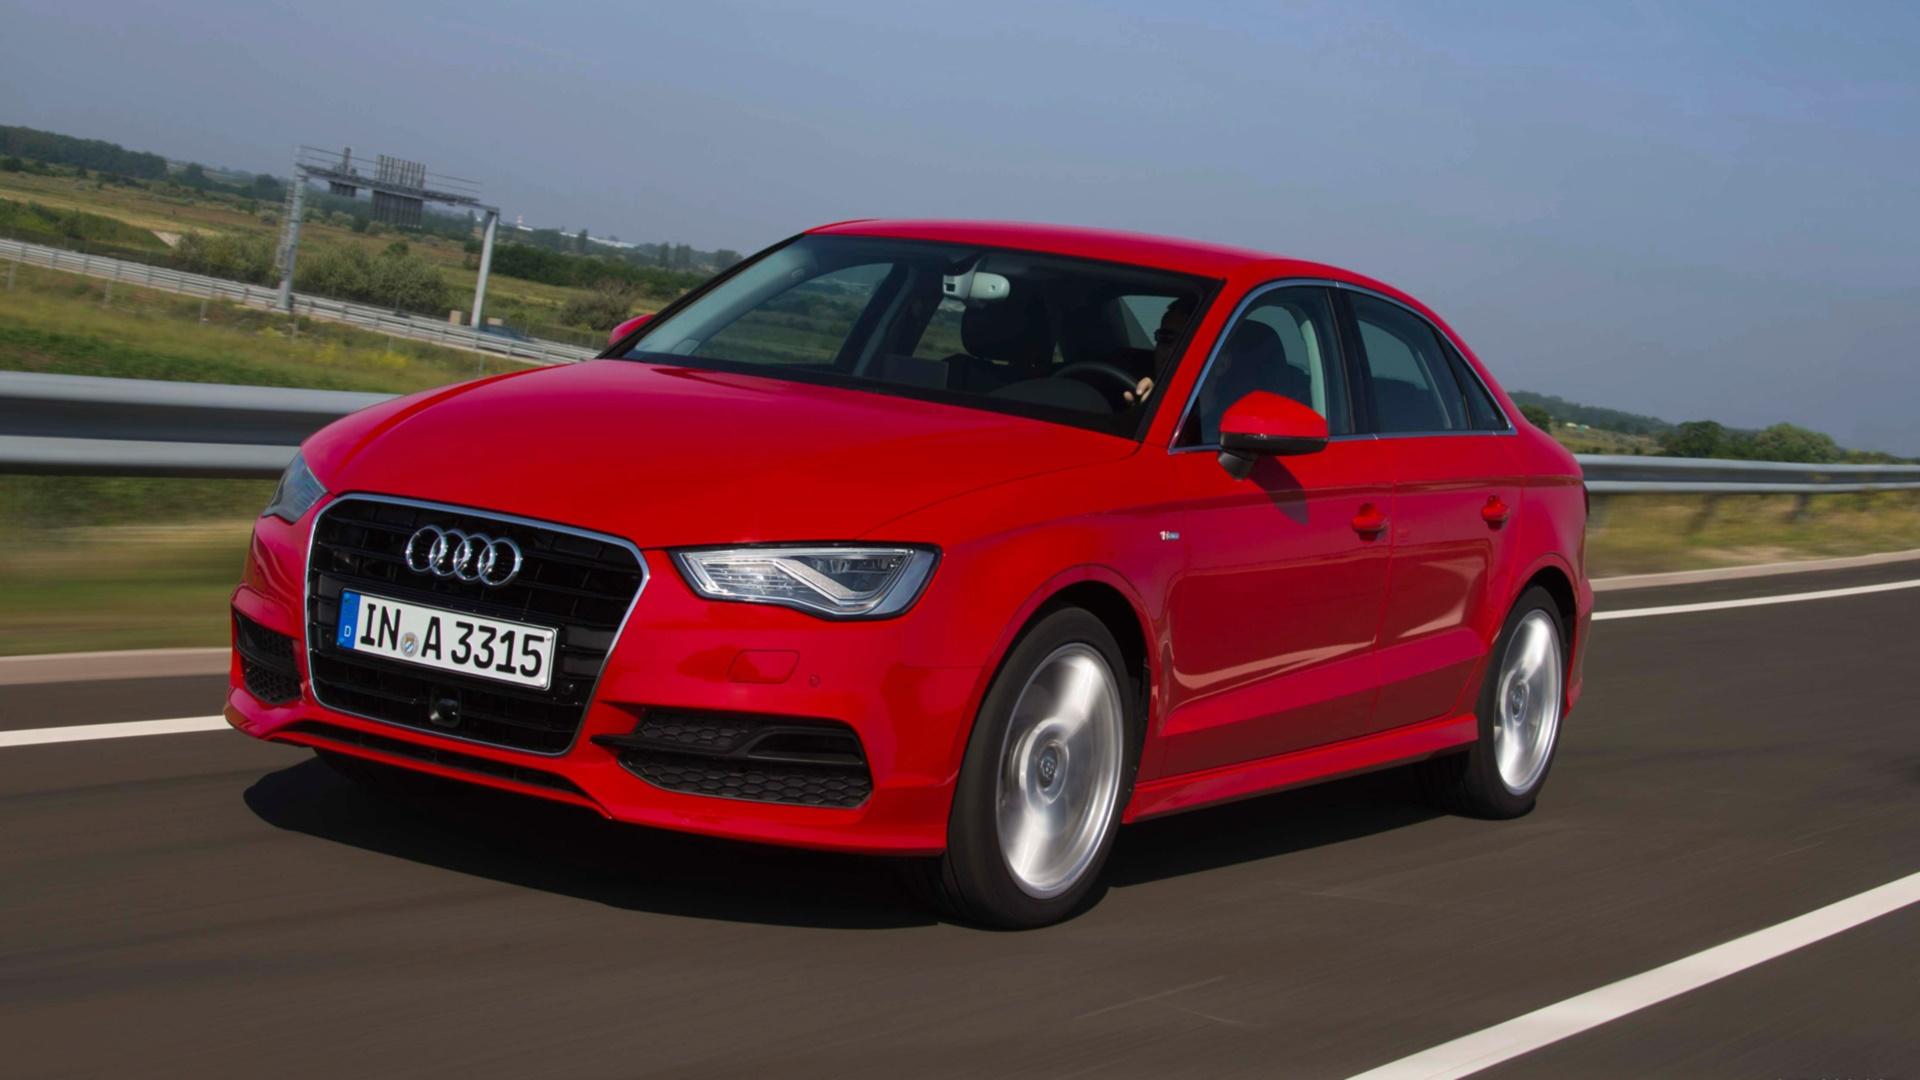 Audi HD Wallpapers